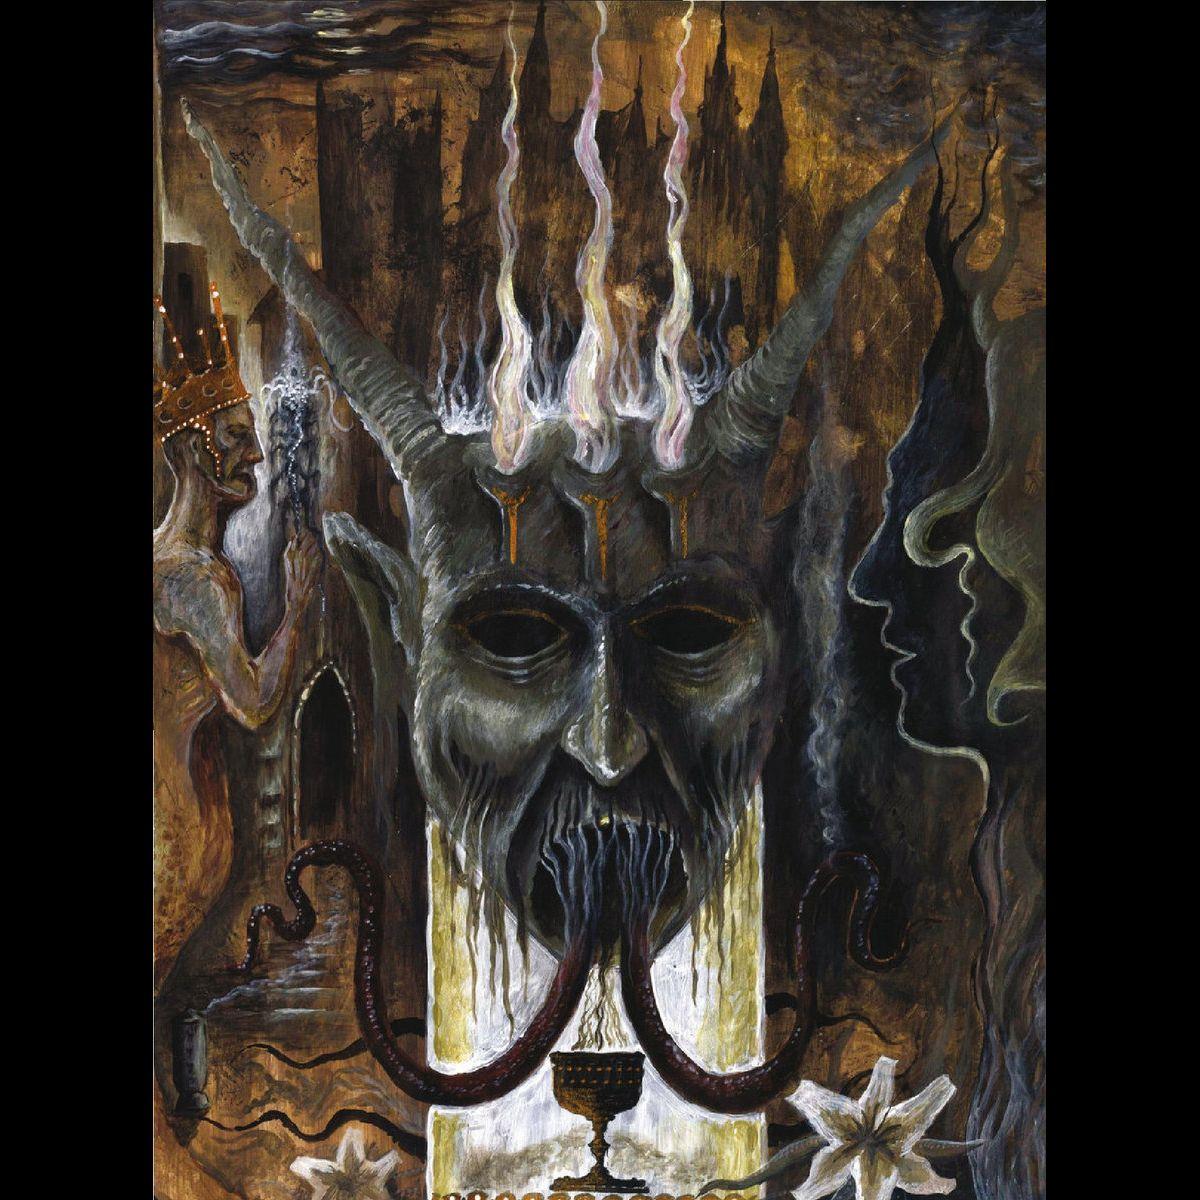 Reviews for Esoctrilihum - Pandaemorthium (Forbidden Formulas to Awaken the Blind Sovereigns of Nothingness)